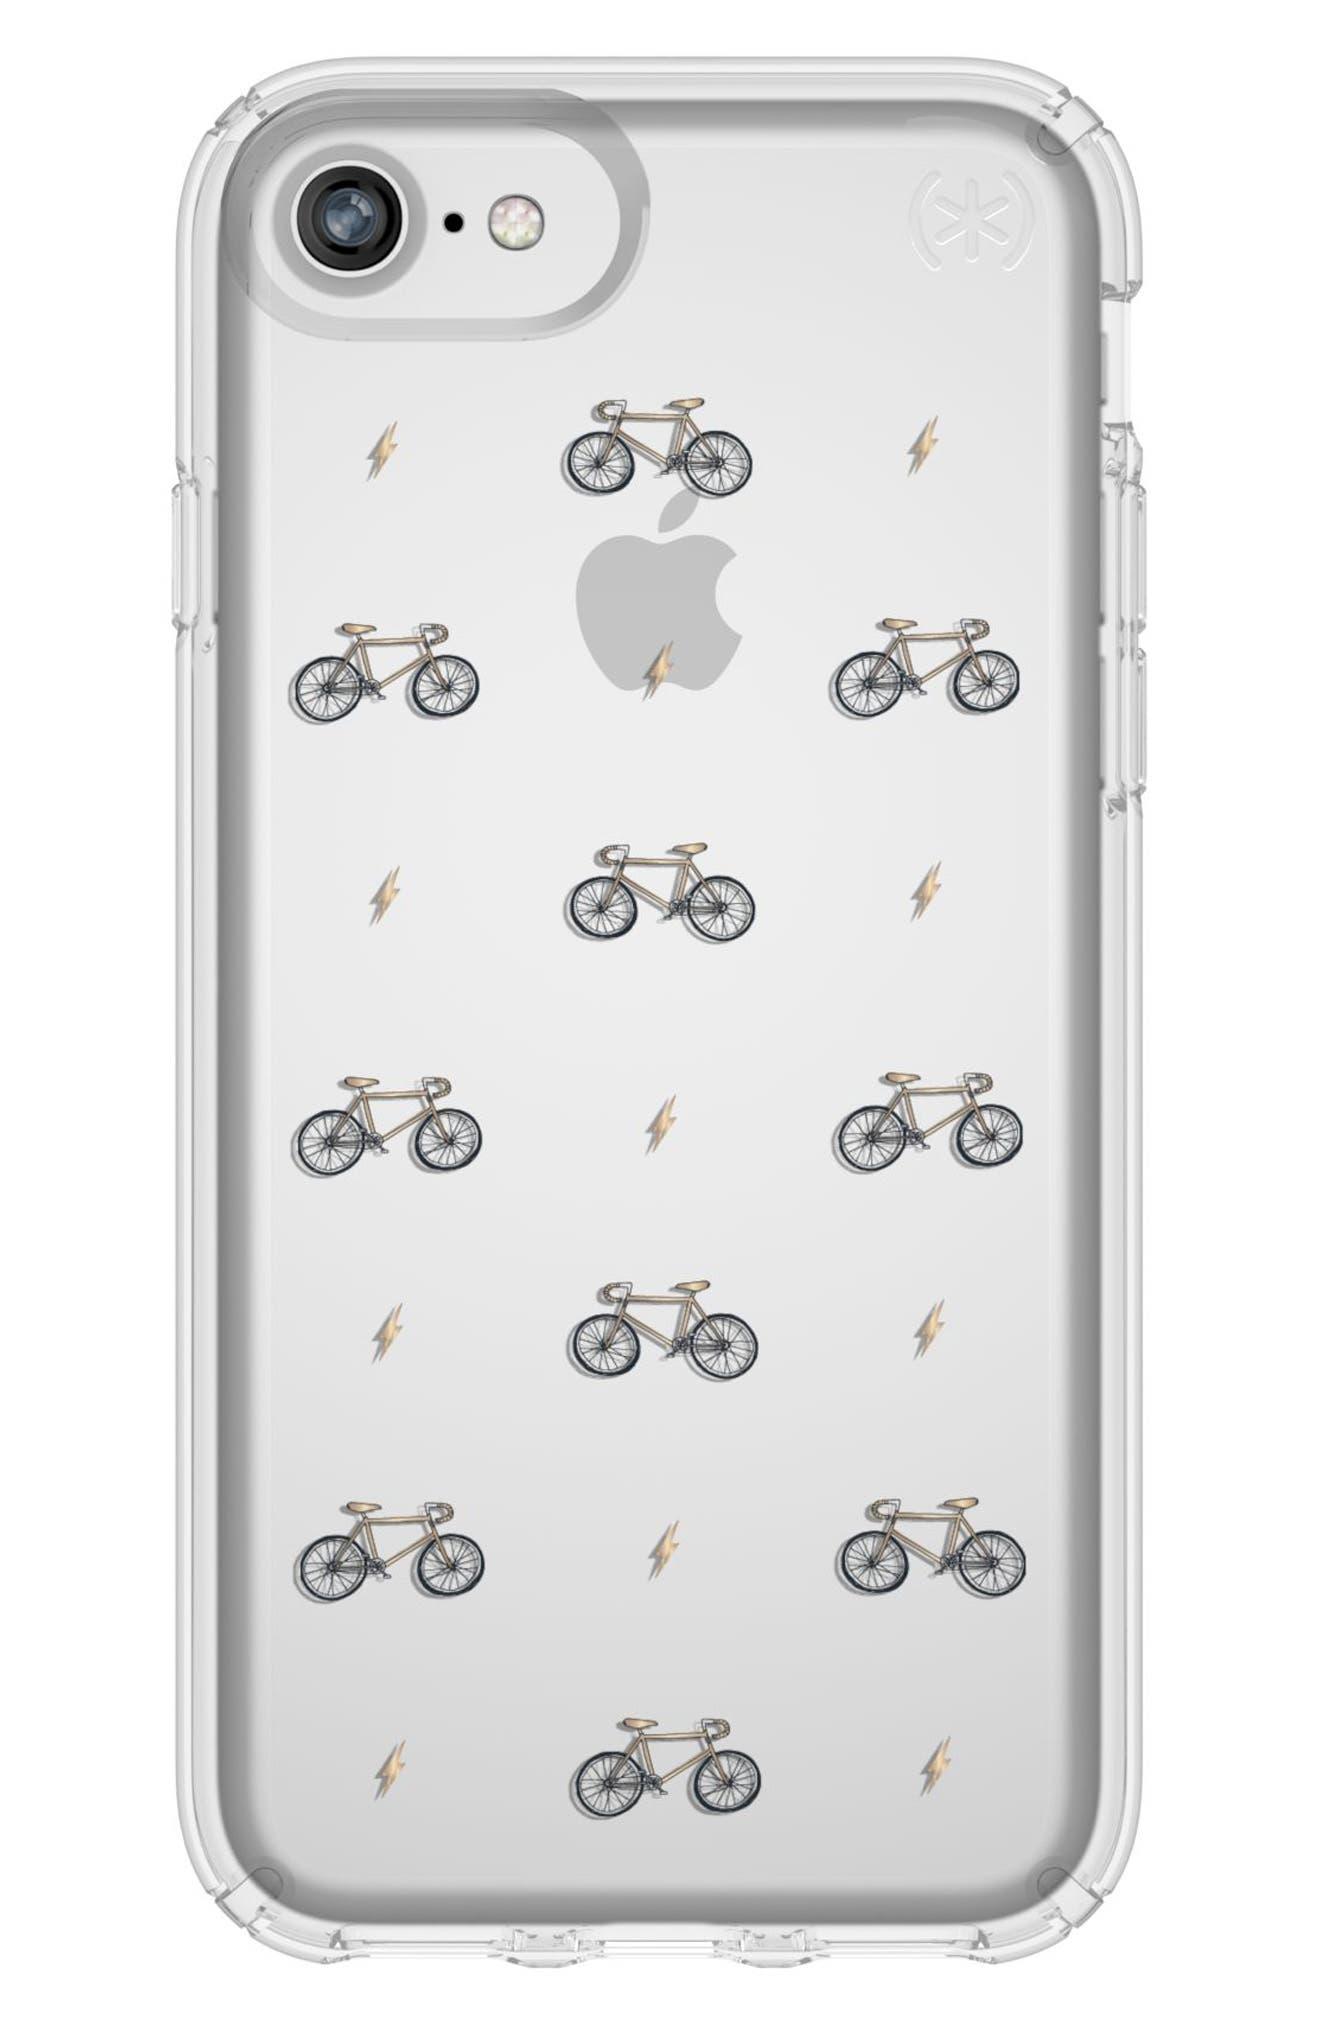 Speck Transparent Bikes & Bolts iPhone 6/6s/7/8 Case